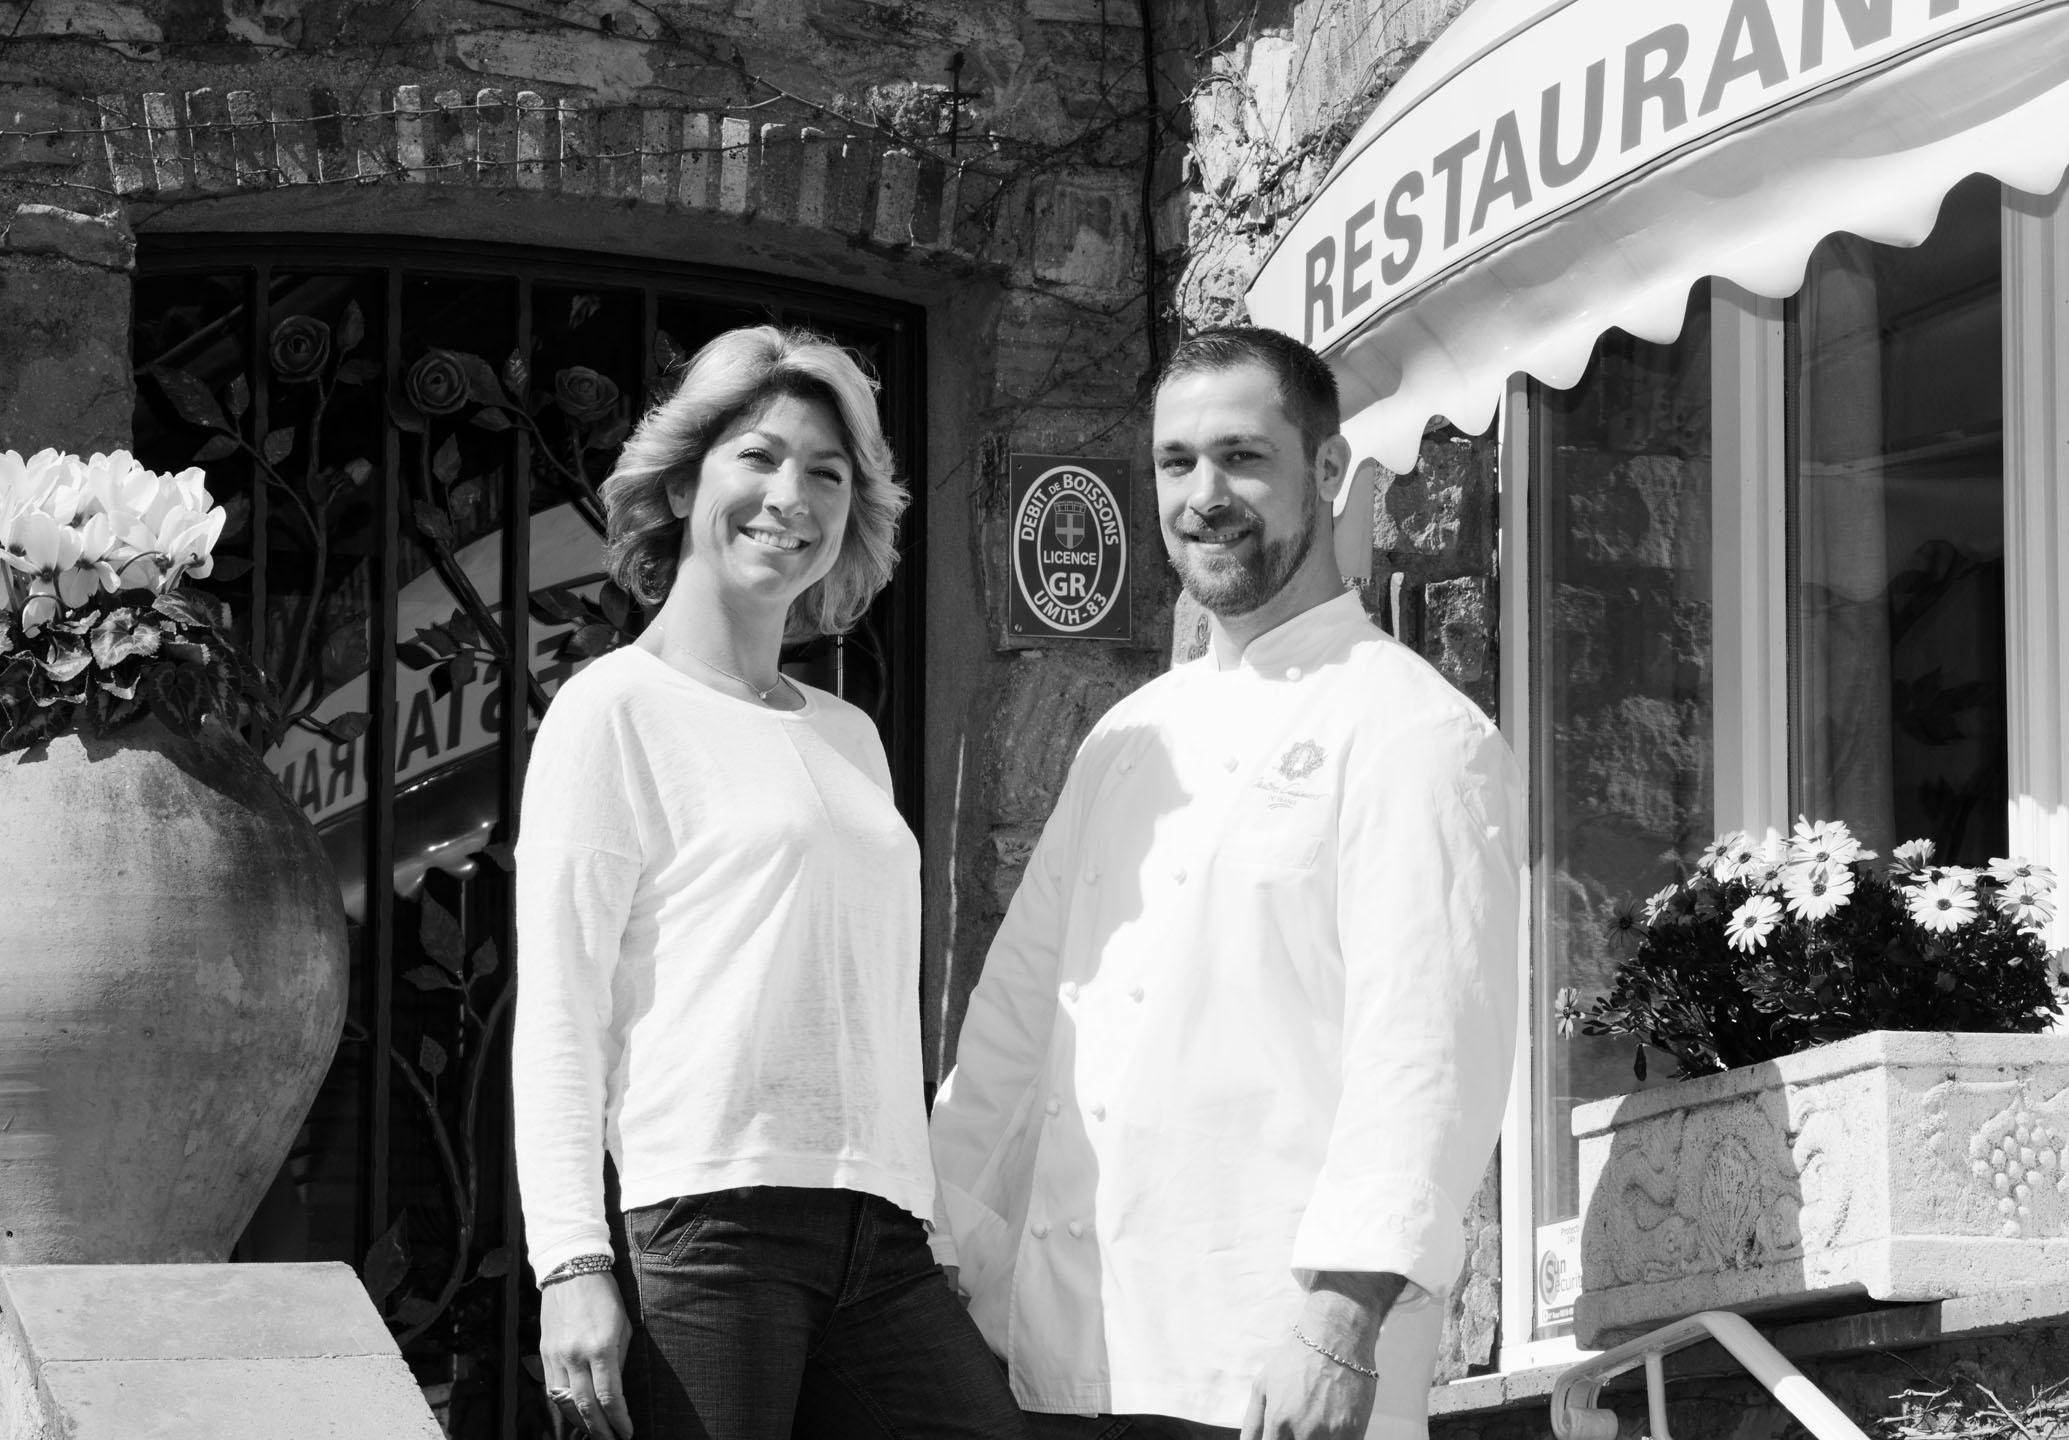 Stéphanie Girard & Julien Allègre